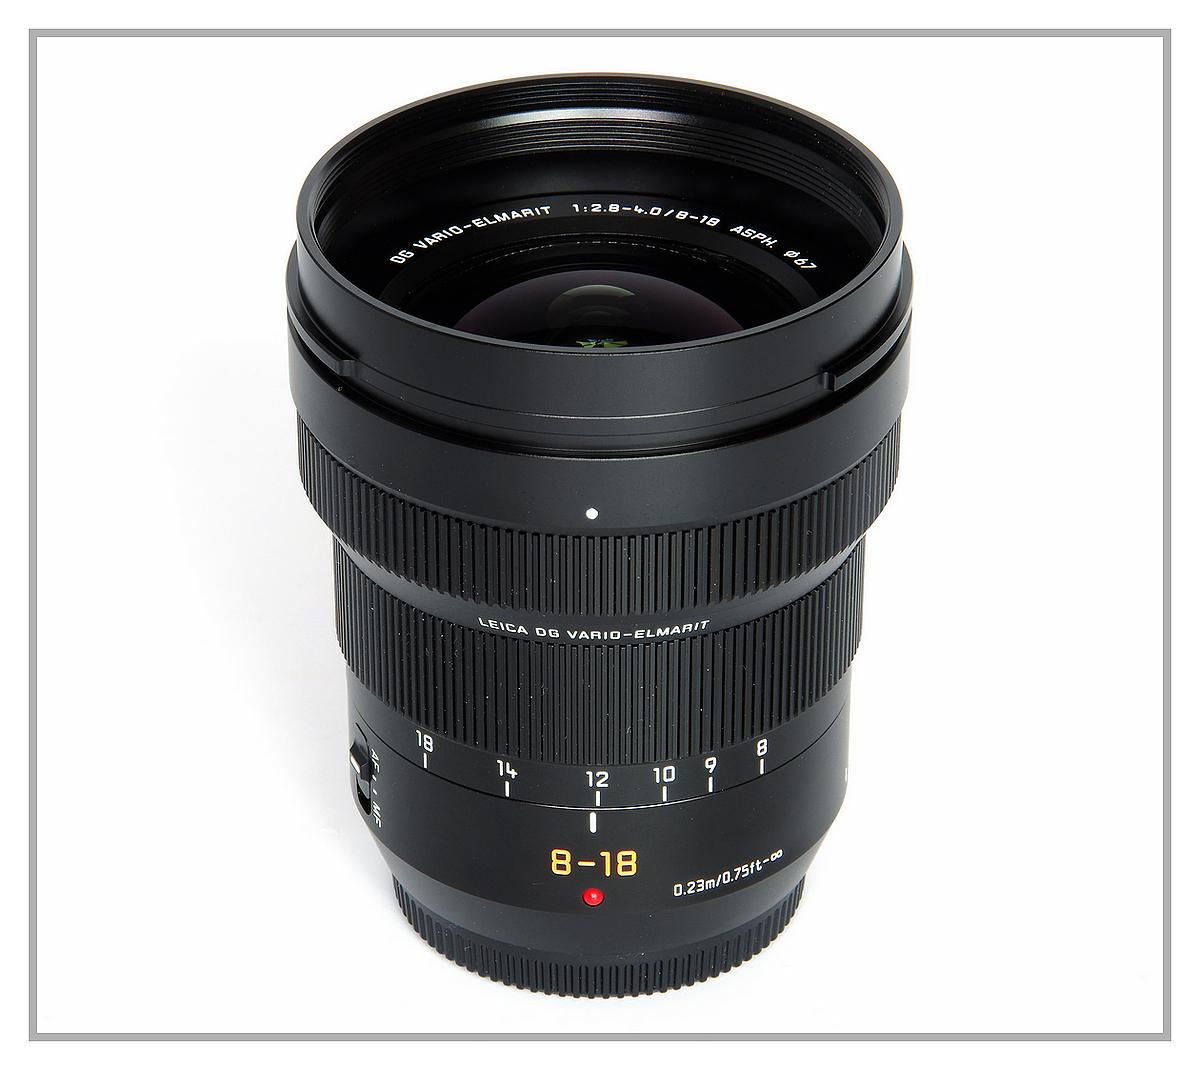 Panasonic Leica DG Vario-Elmarit 8-18 f2.8-4.0 ASPH